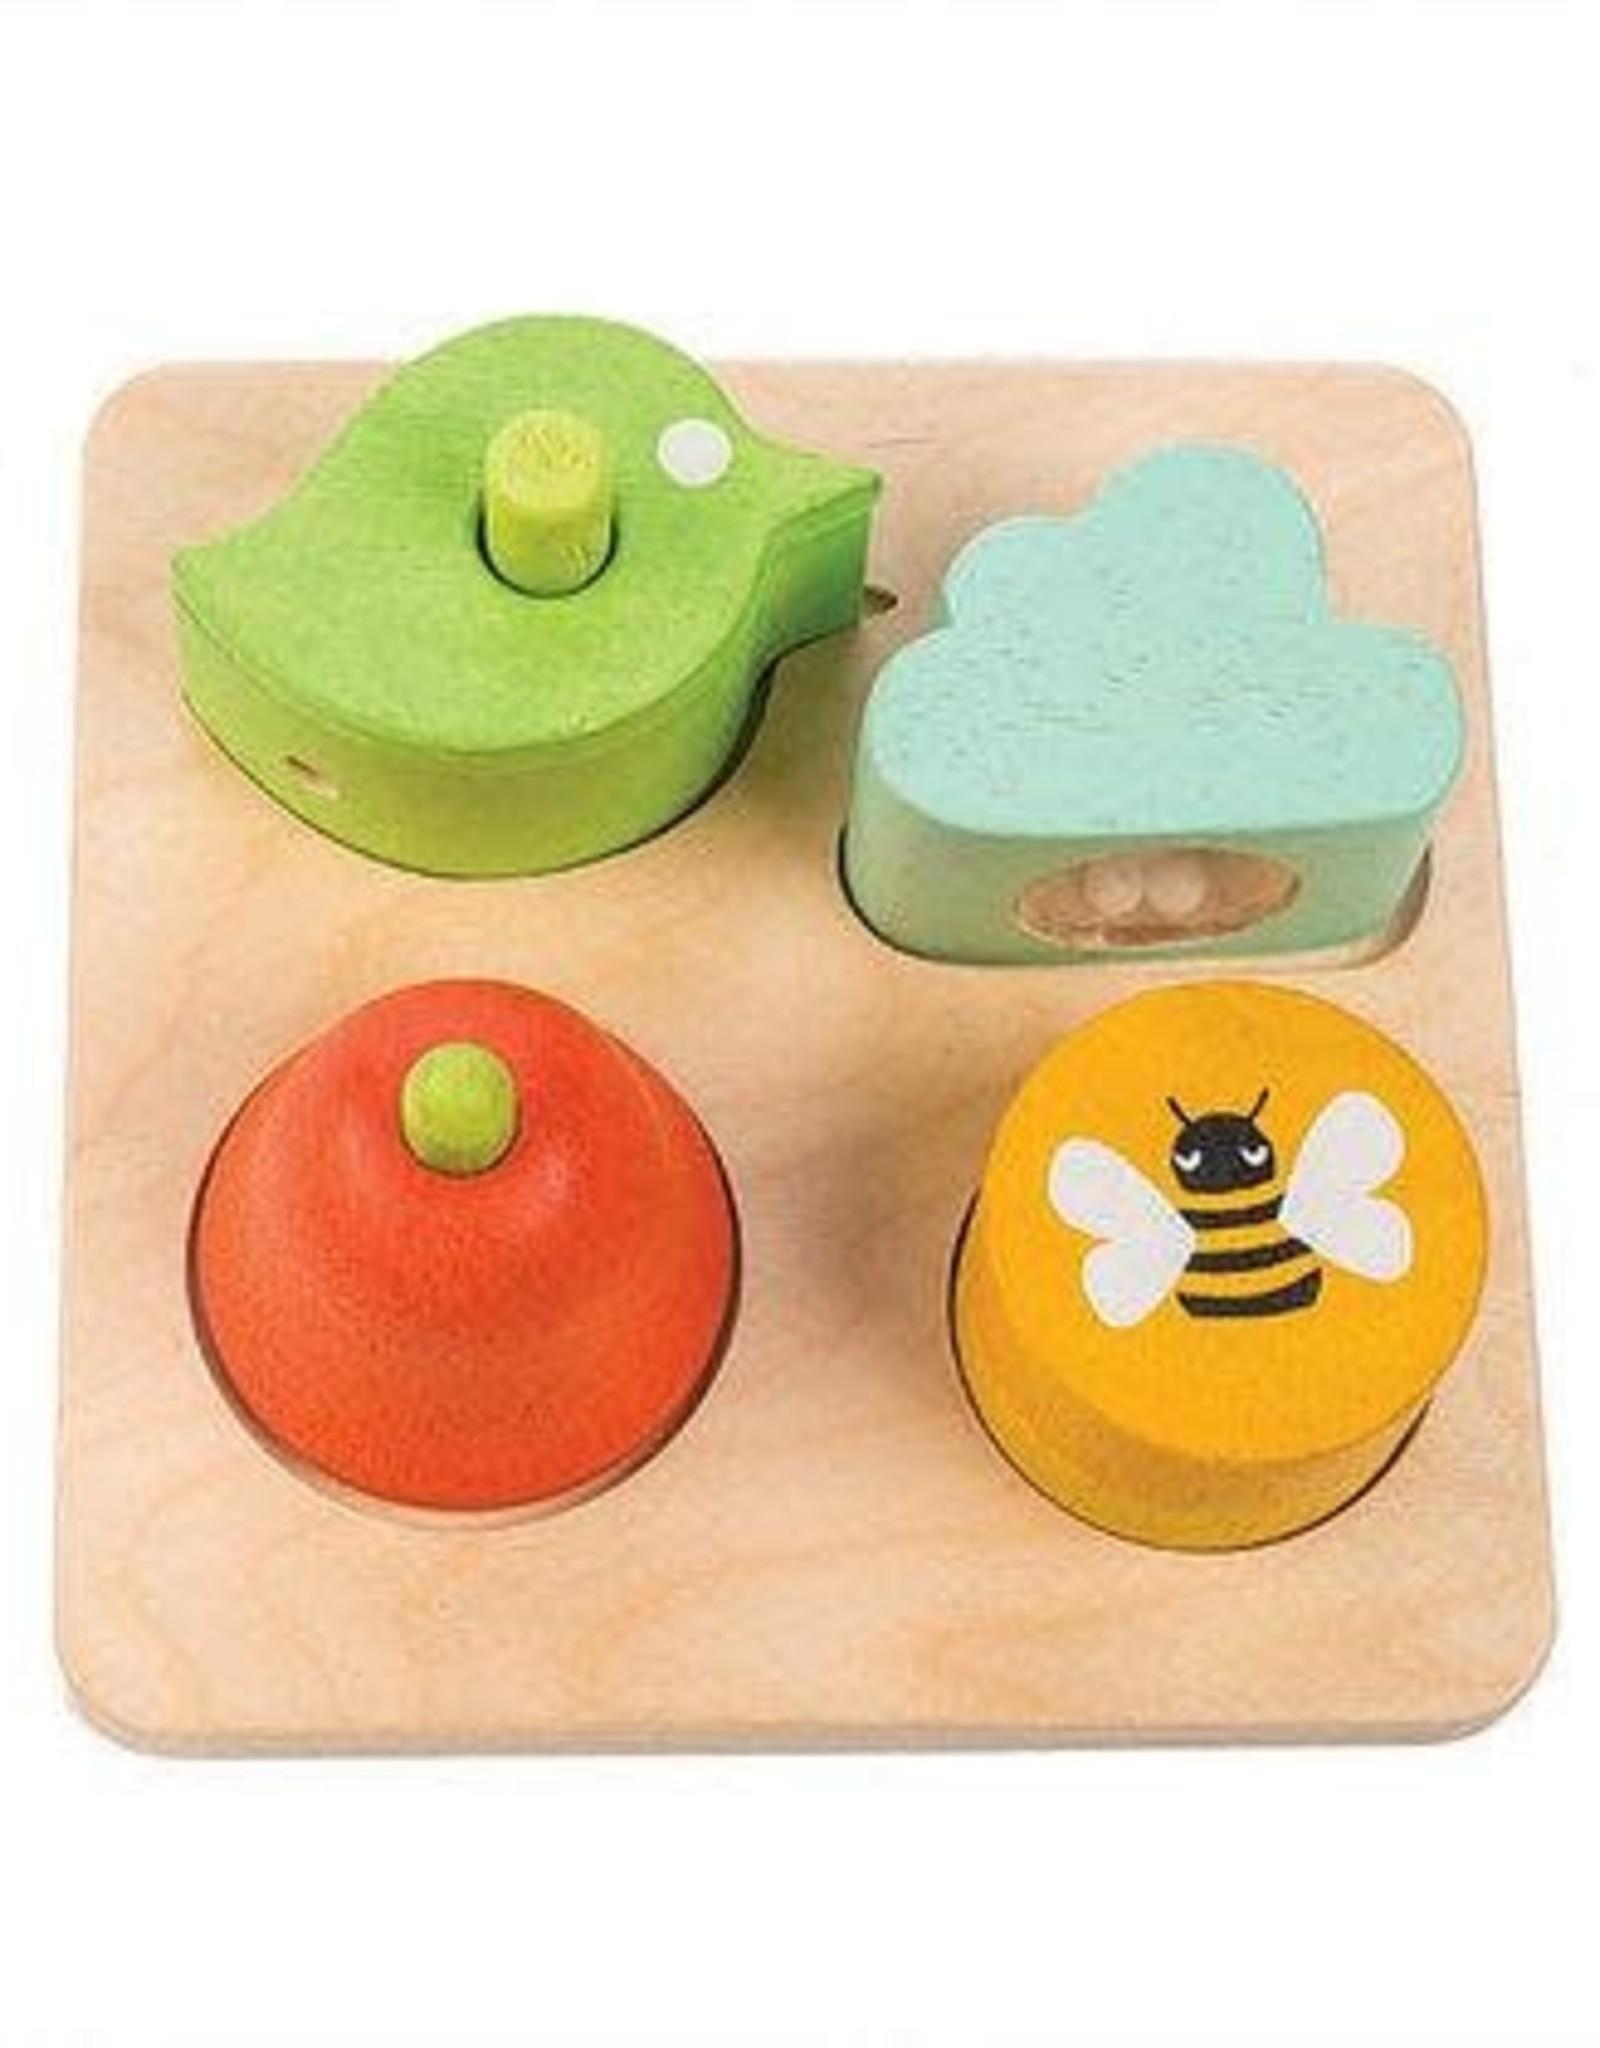 Tender Leaf Toys Audio Sensory Tray